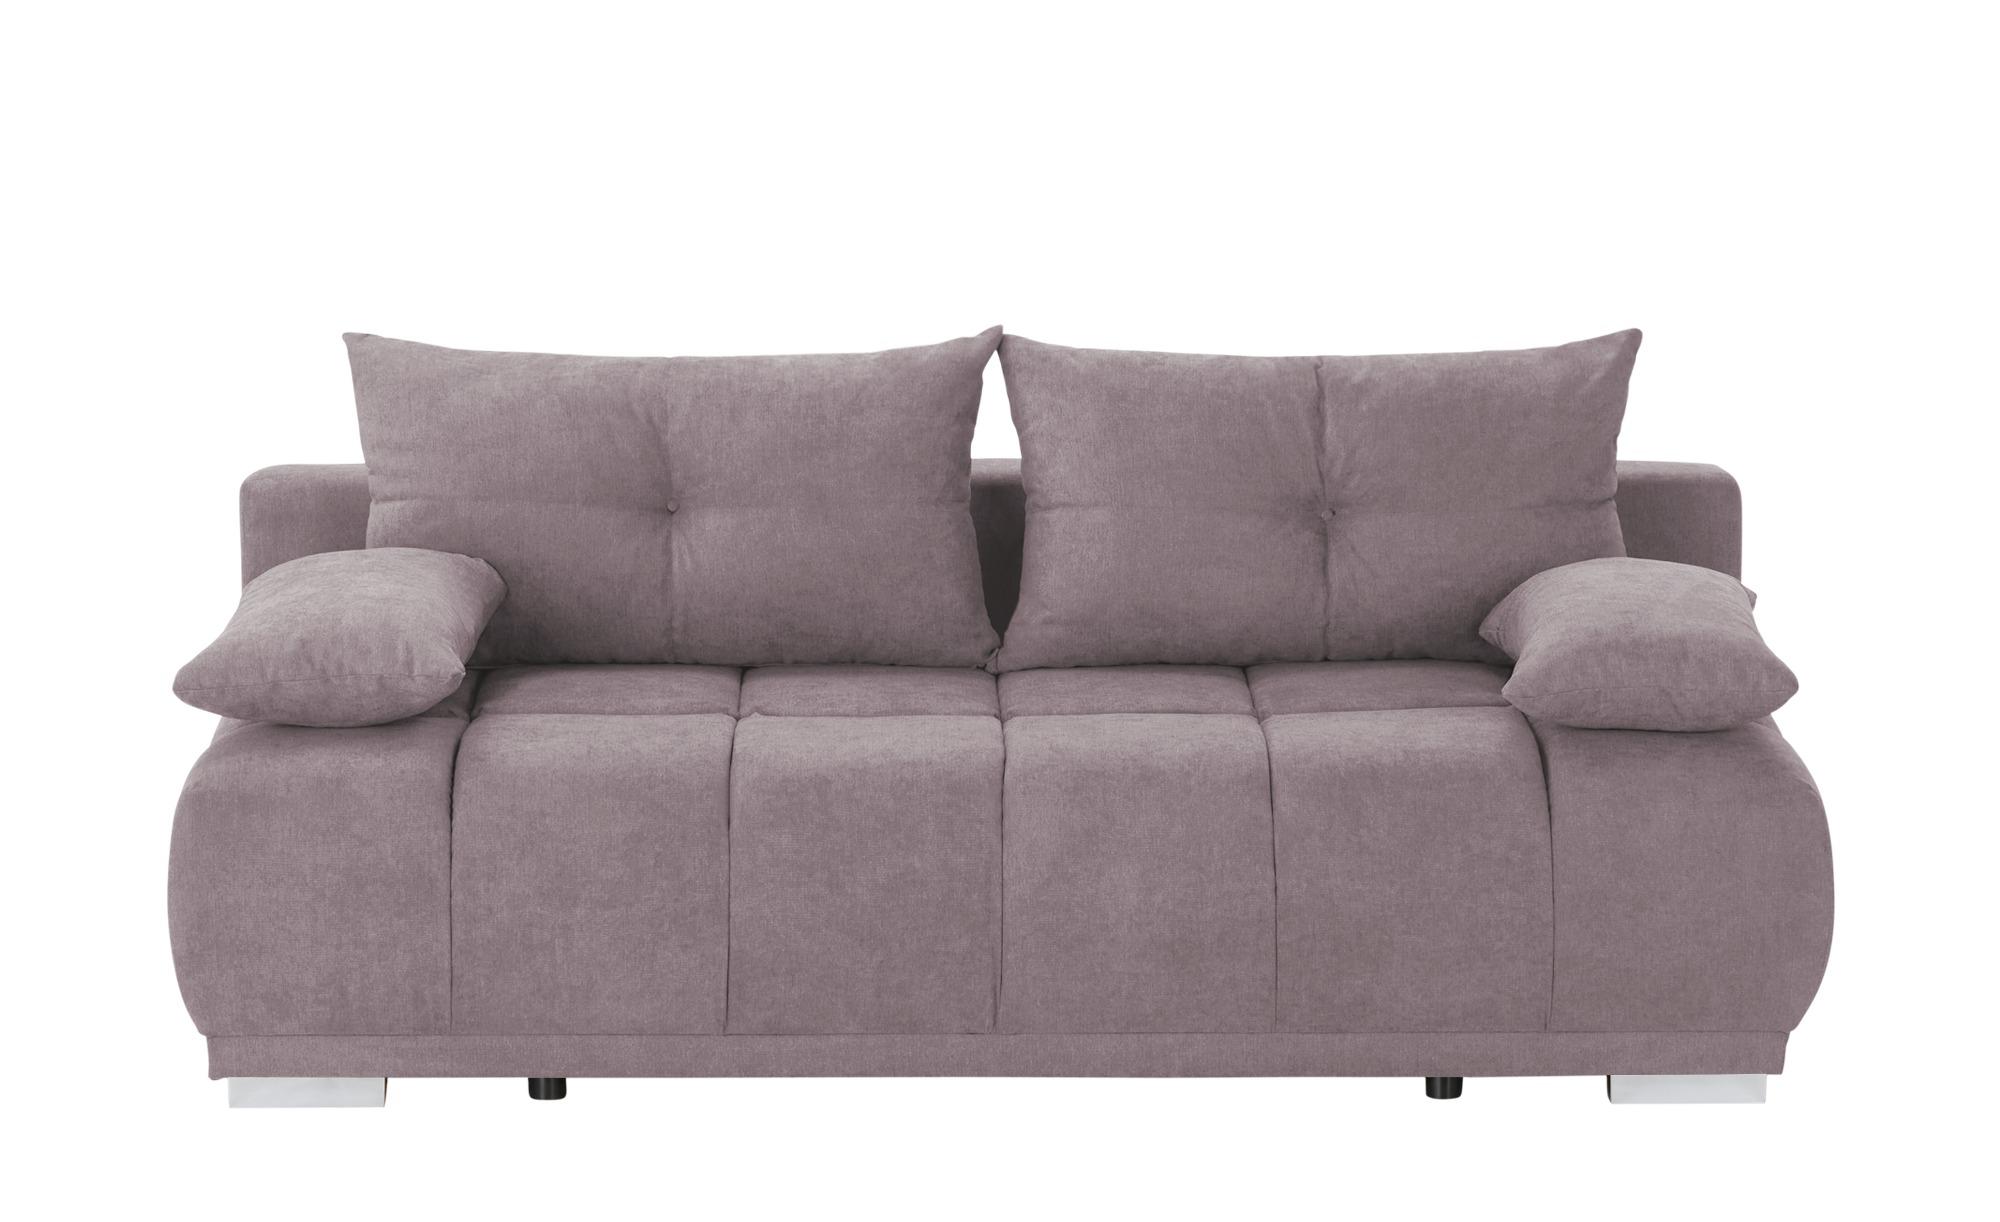 switch Schlafsofa  Gala ¦ lila/violett ¦ Maße (cm): B: 208 H: 92 T: 102 Polstermöbel > Sofas > 2-Sitzer - Höffner